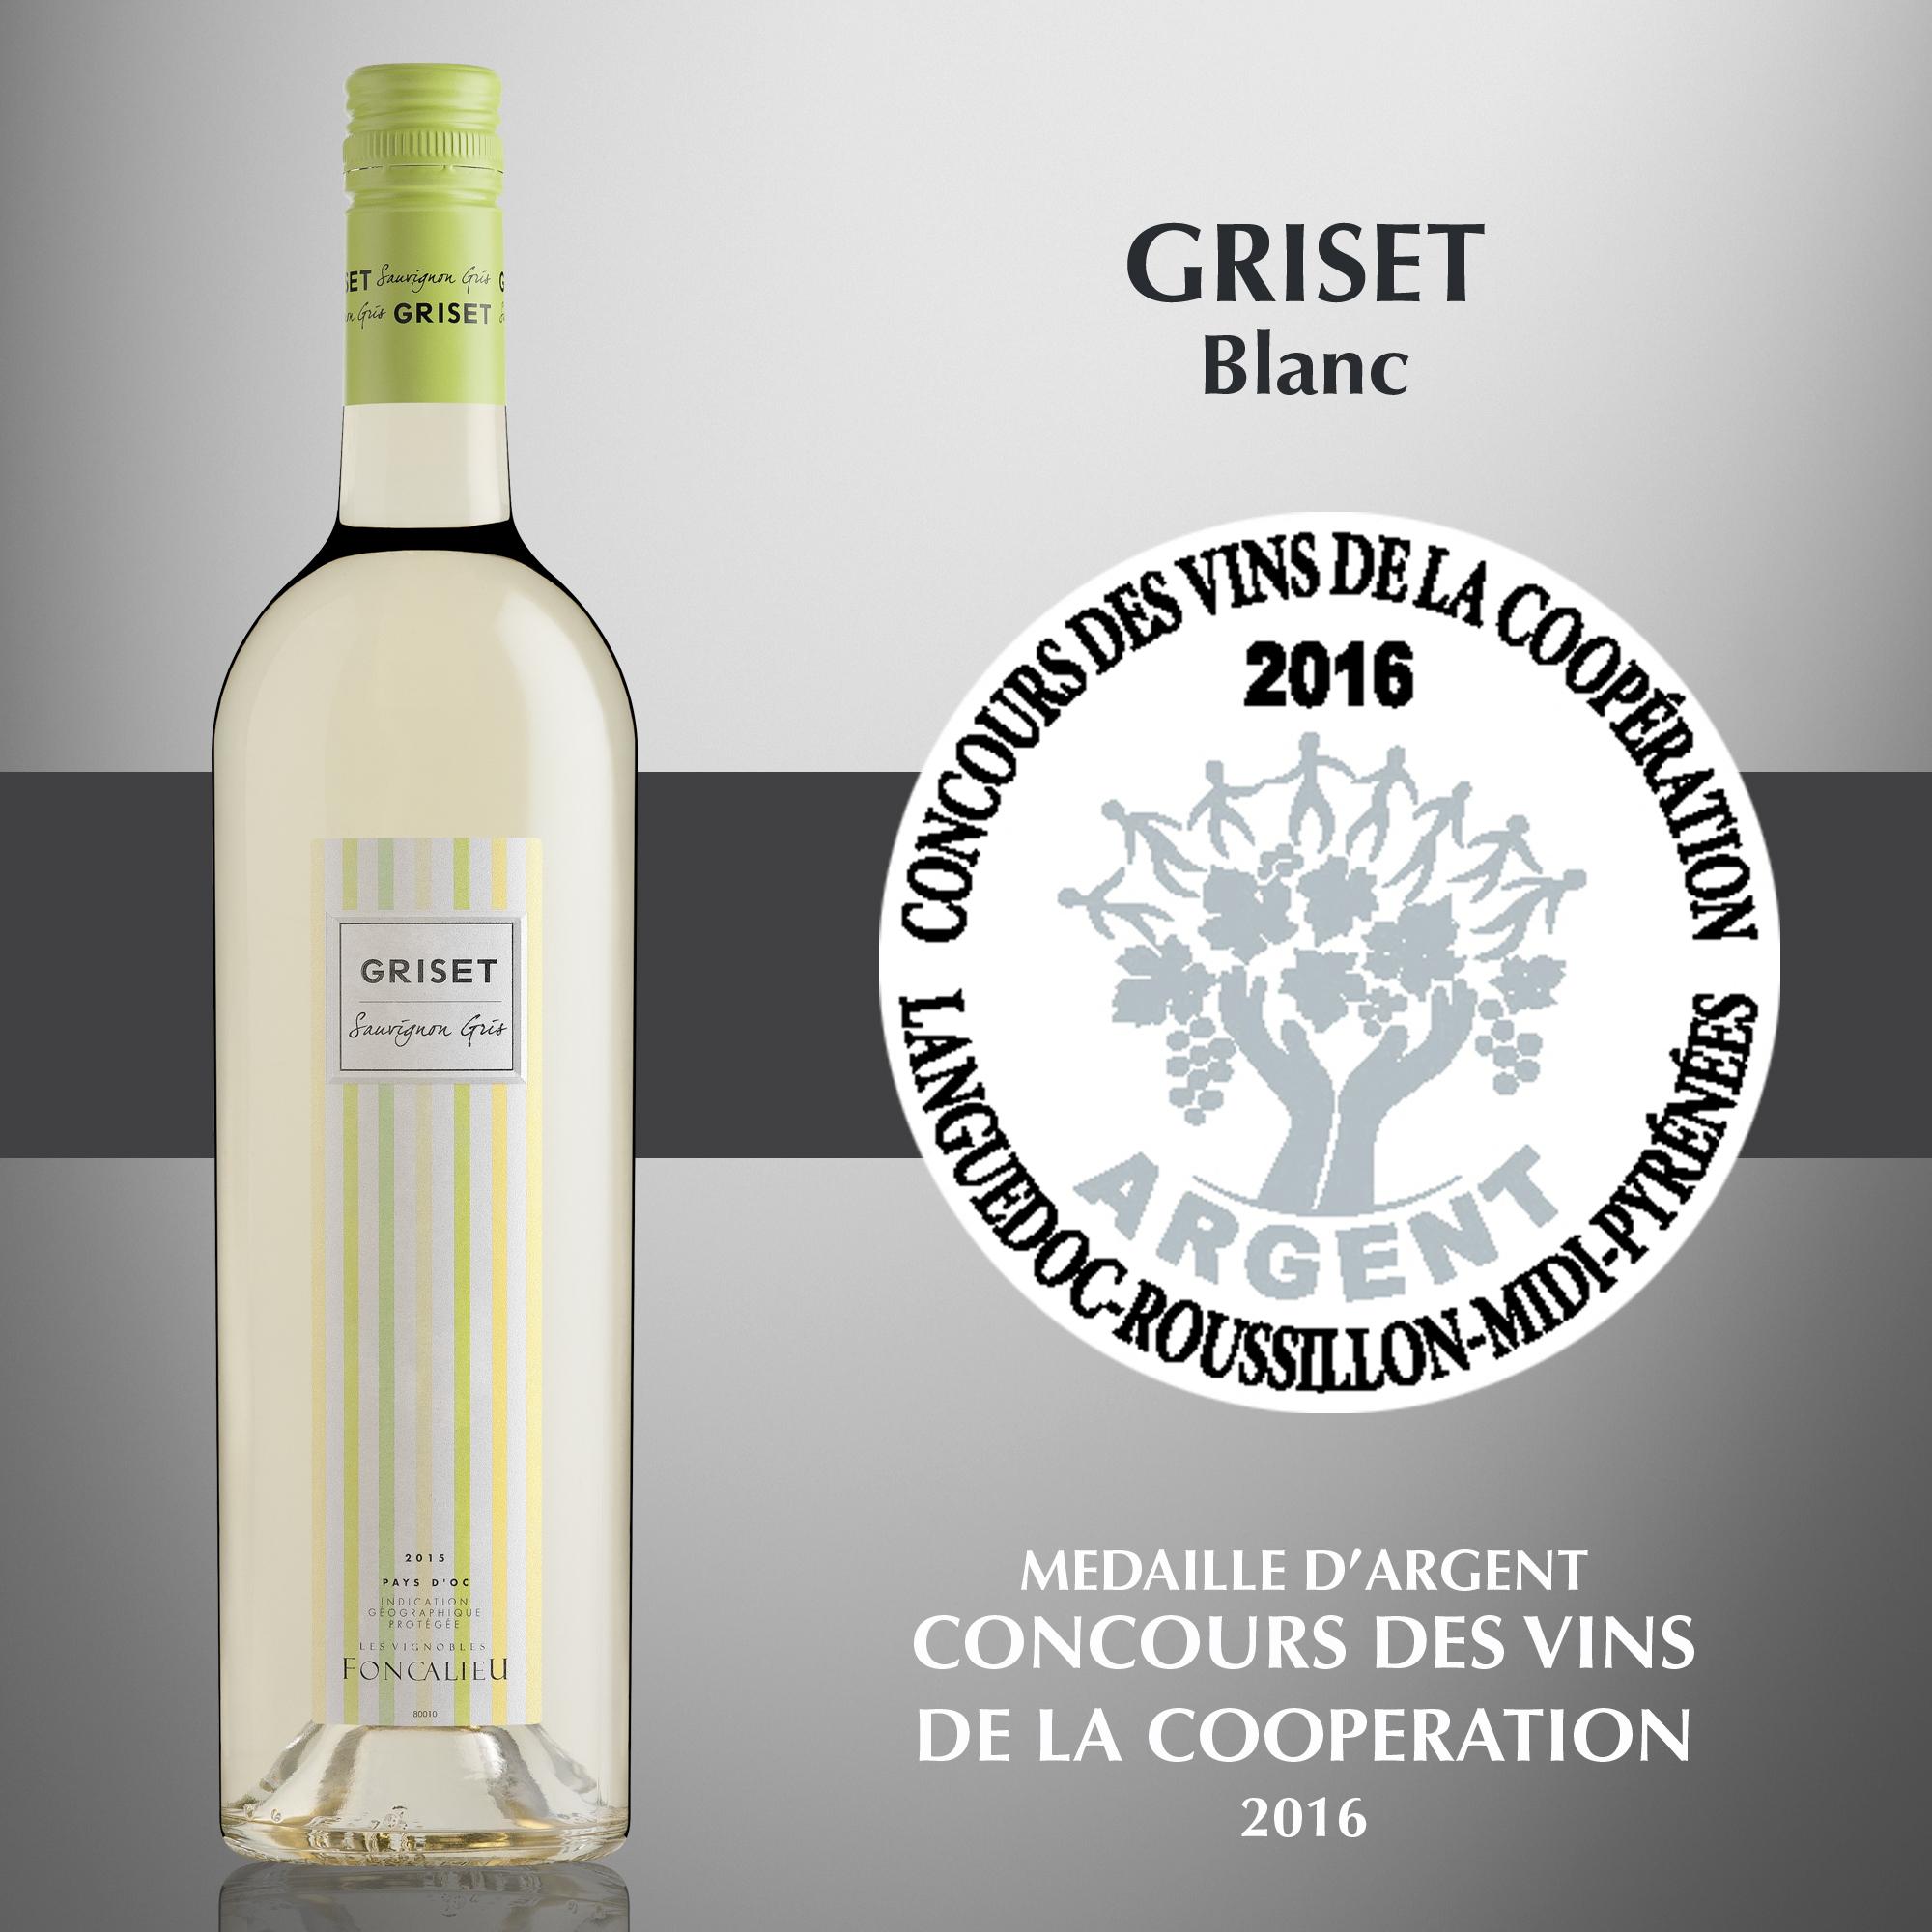 Griset Blanc - IGP Pays d'Oc